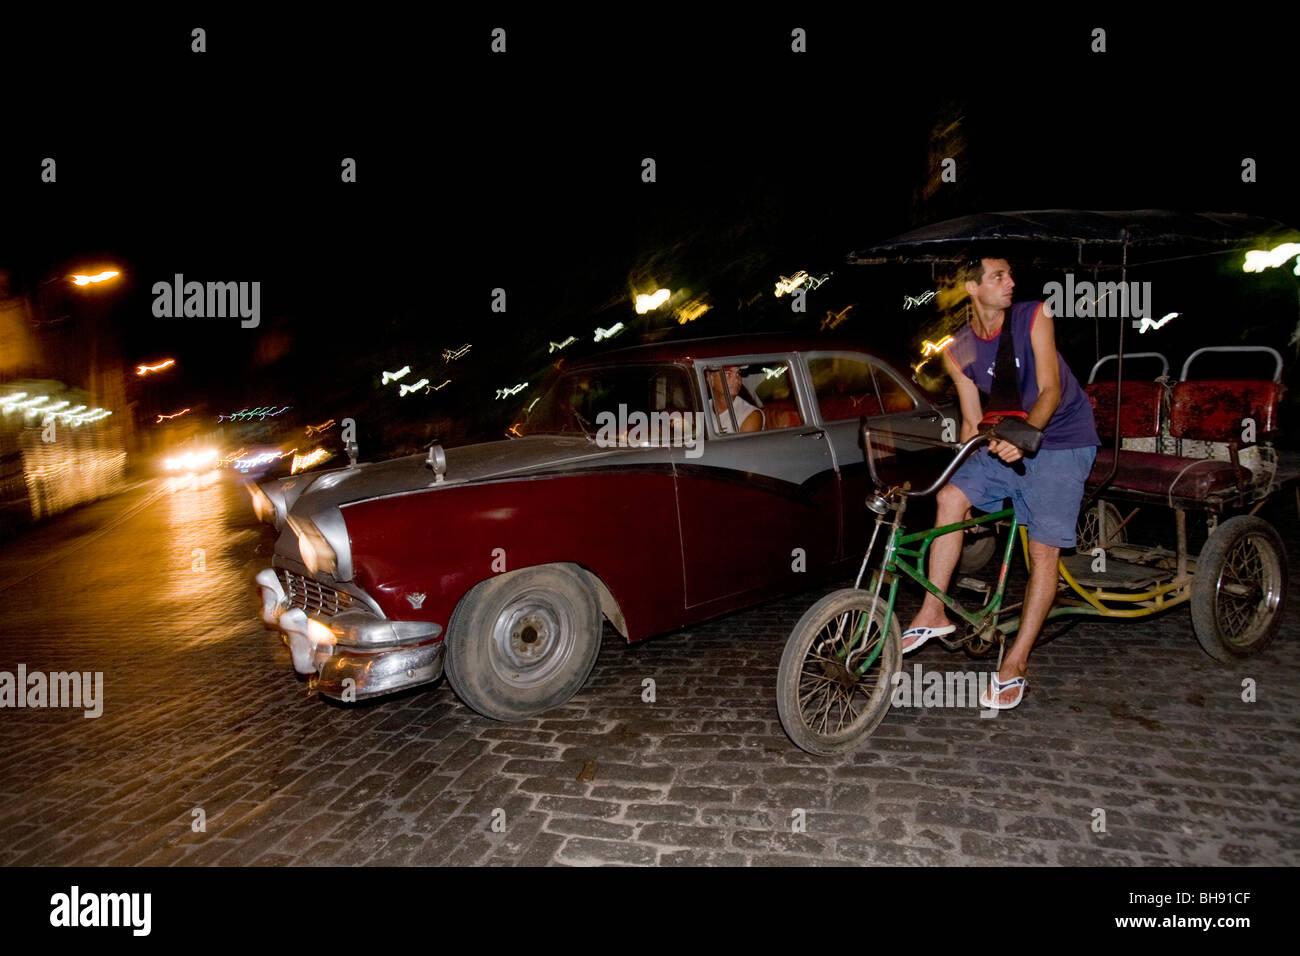 Straßenszene von Nachtleben, Camagueey, Karibisches Meer, Kuba Stockbild